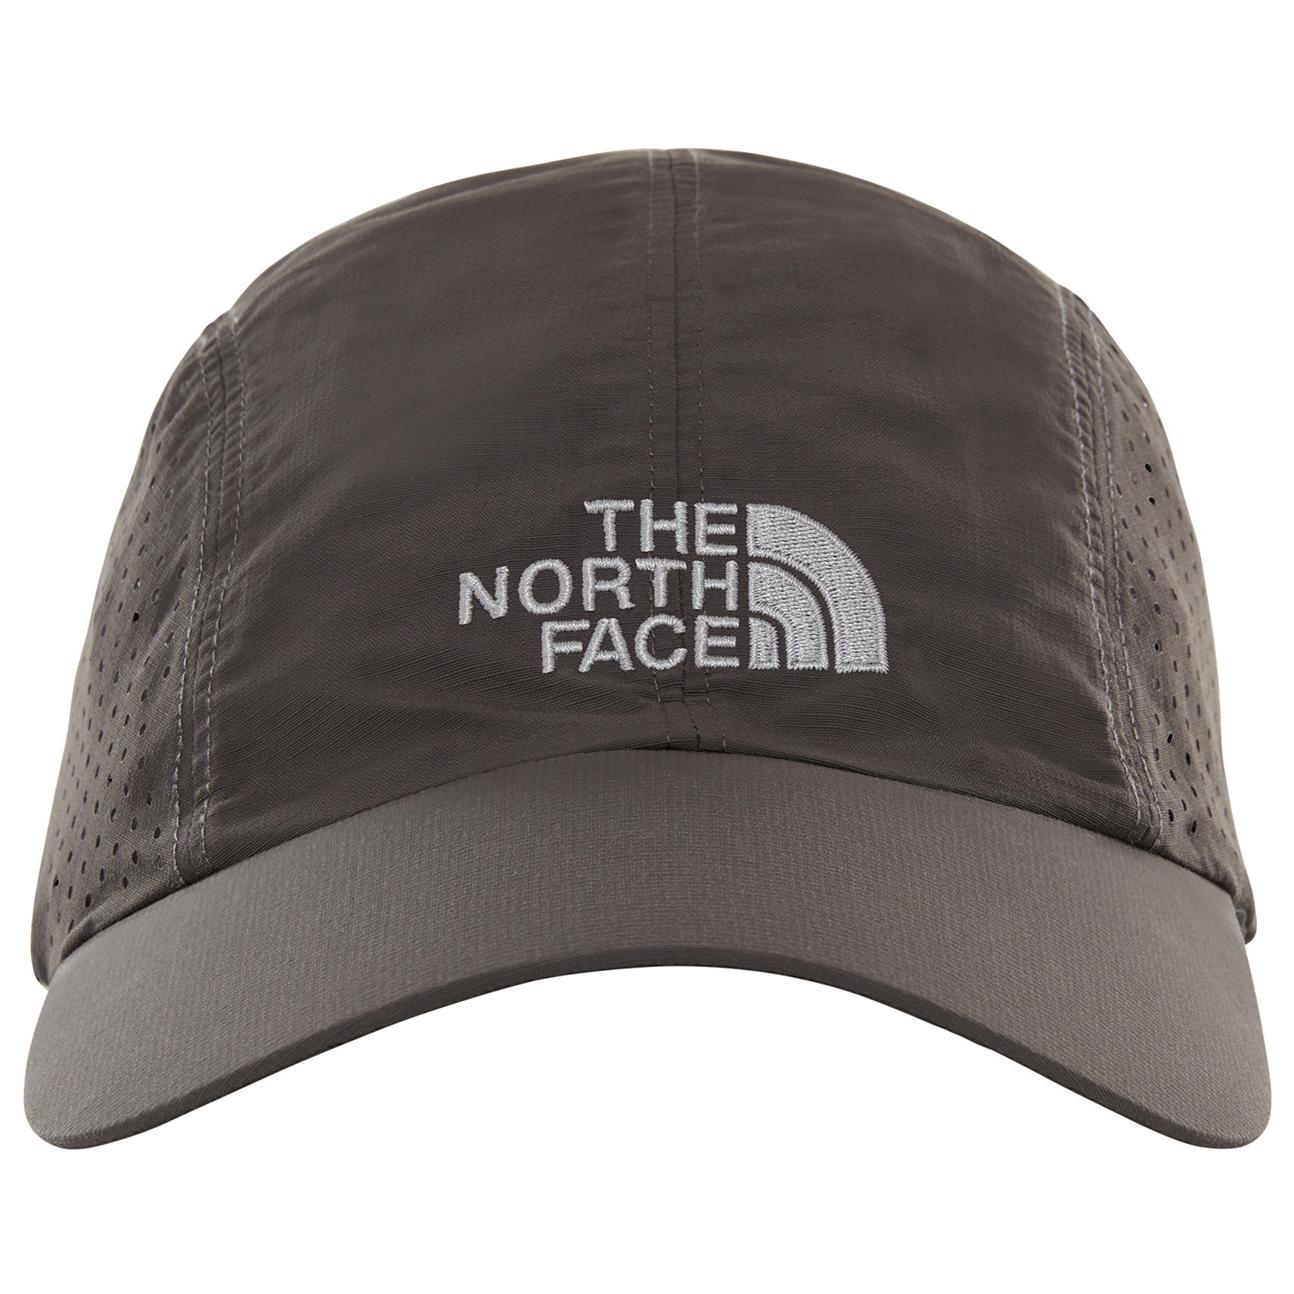 The North Face - Sun Shield Ball Cap 2816681baeb